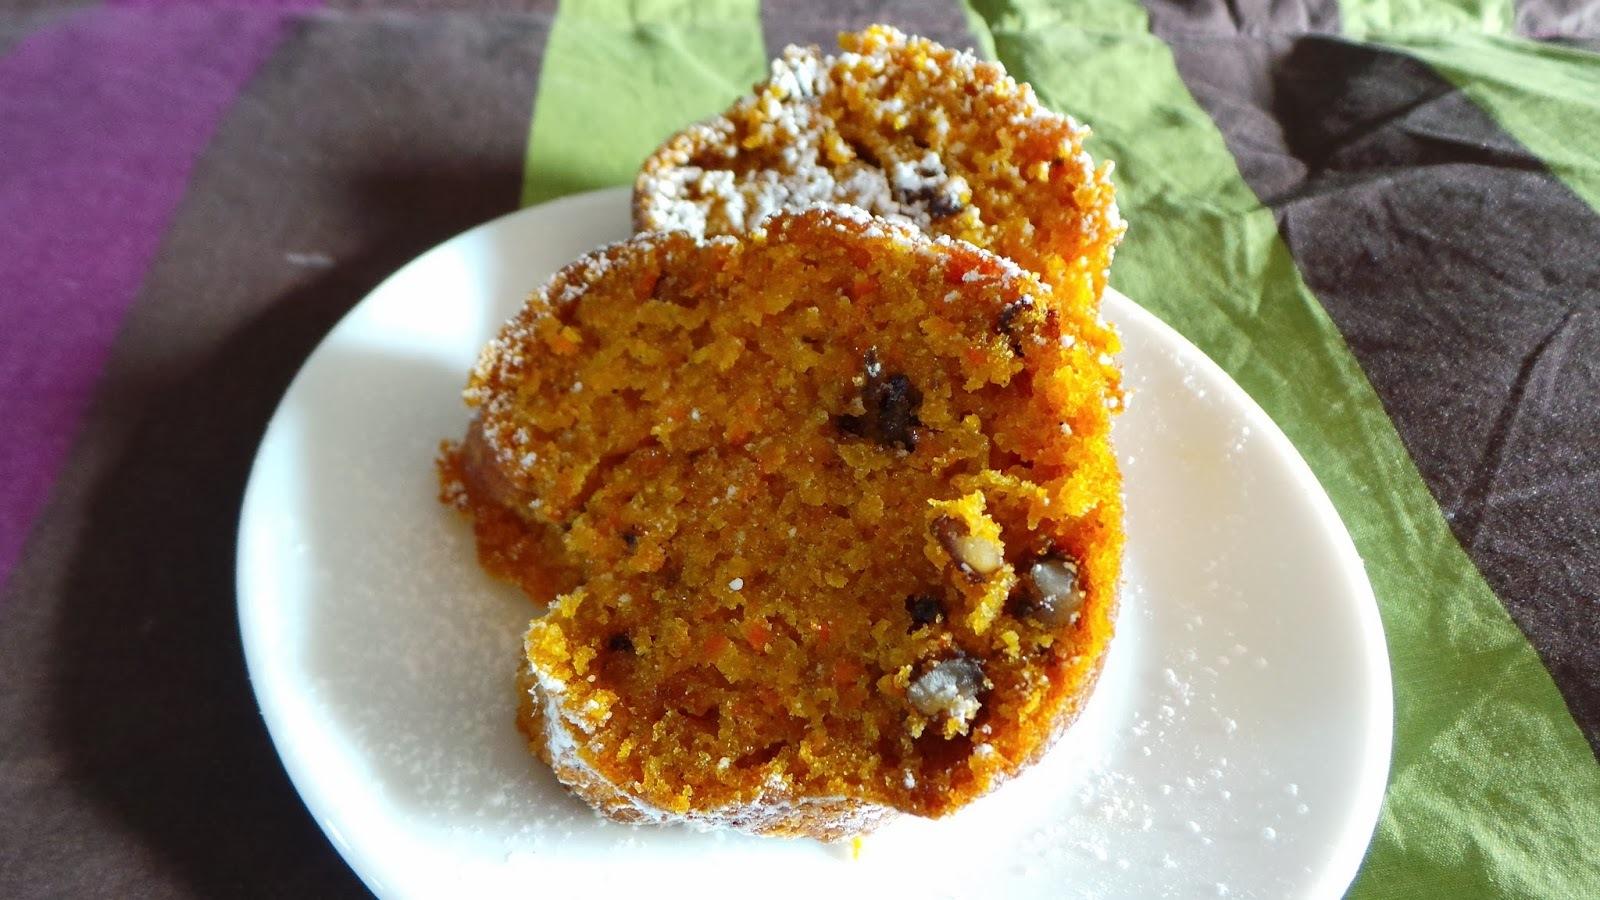 Rico y facil: Queque de zanahoria